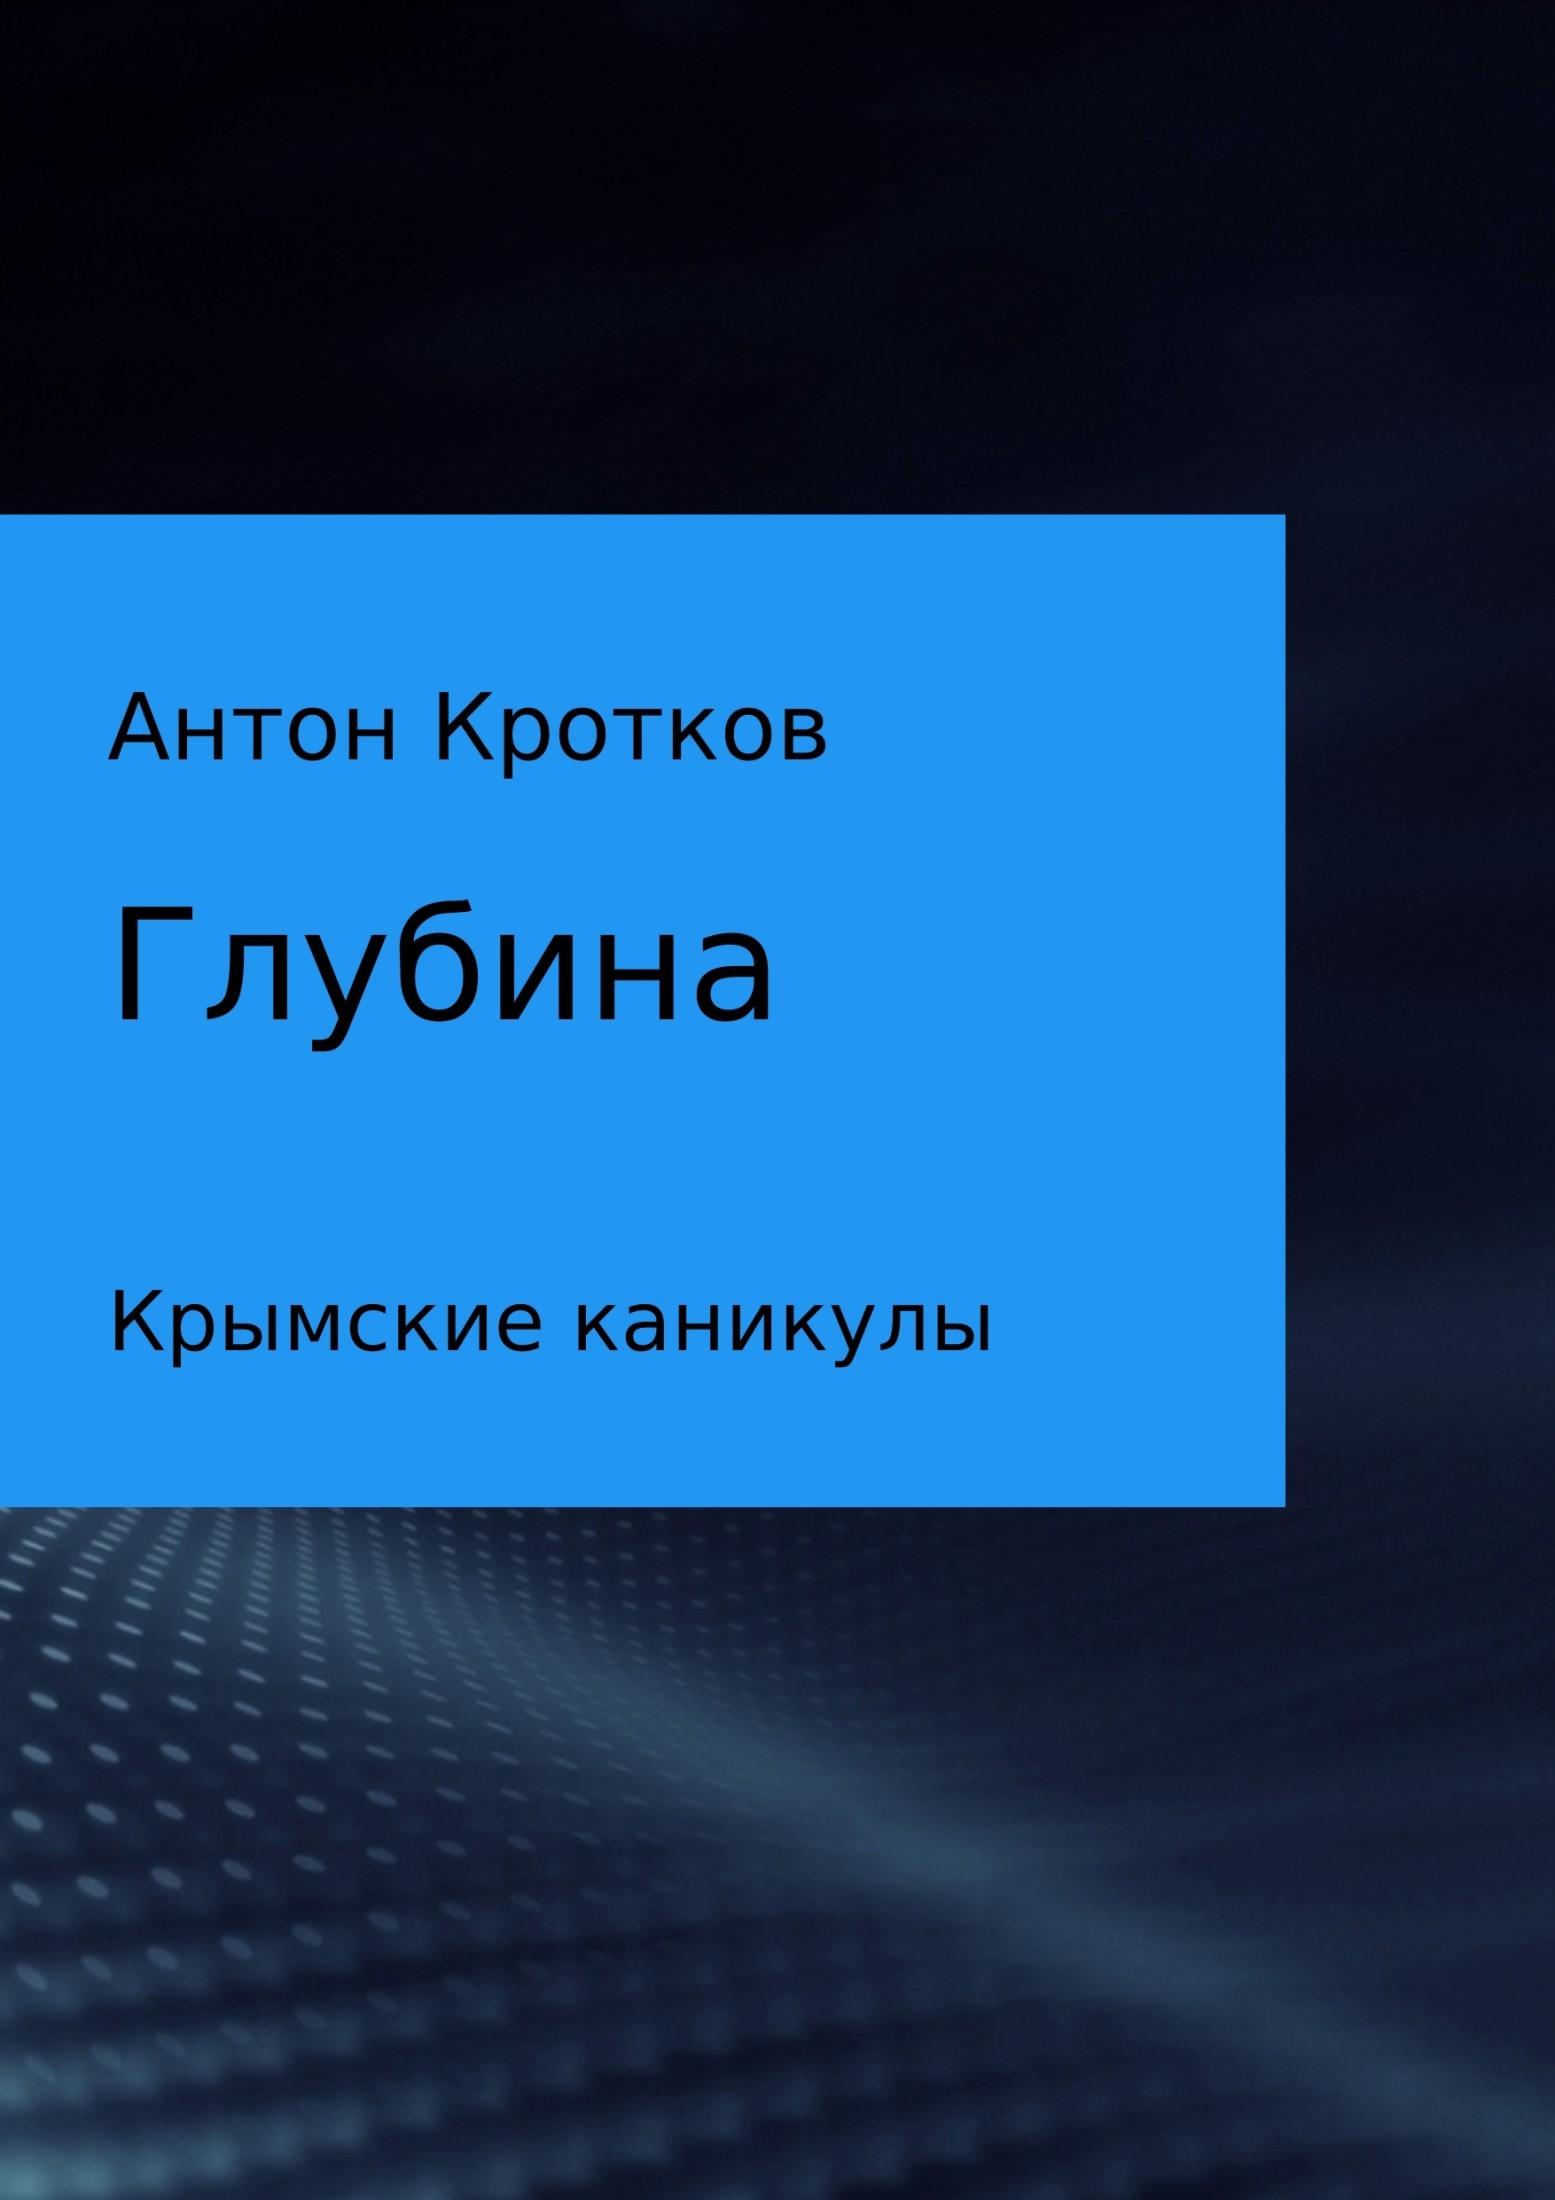 Антон Кротков - Глубина